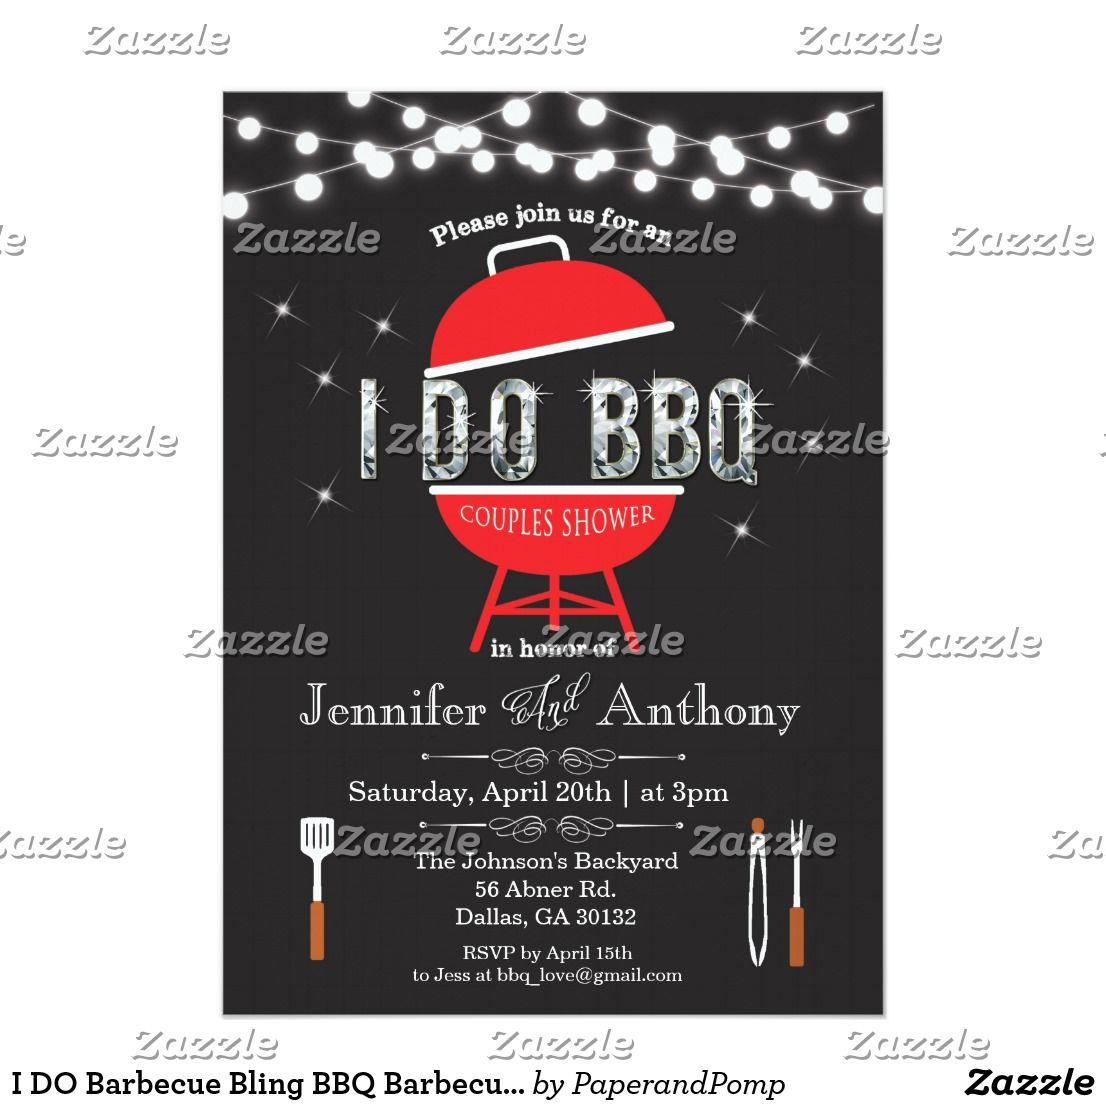 I DO Barbecue Bling BBQ Barbecue Invitation | Pinterest | Invites ...